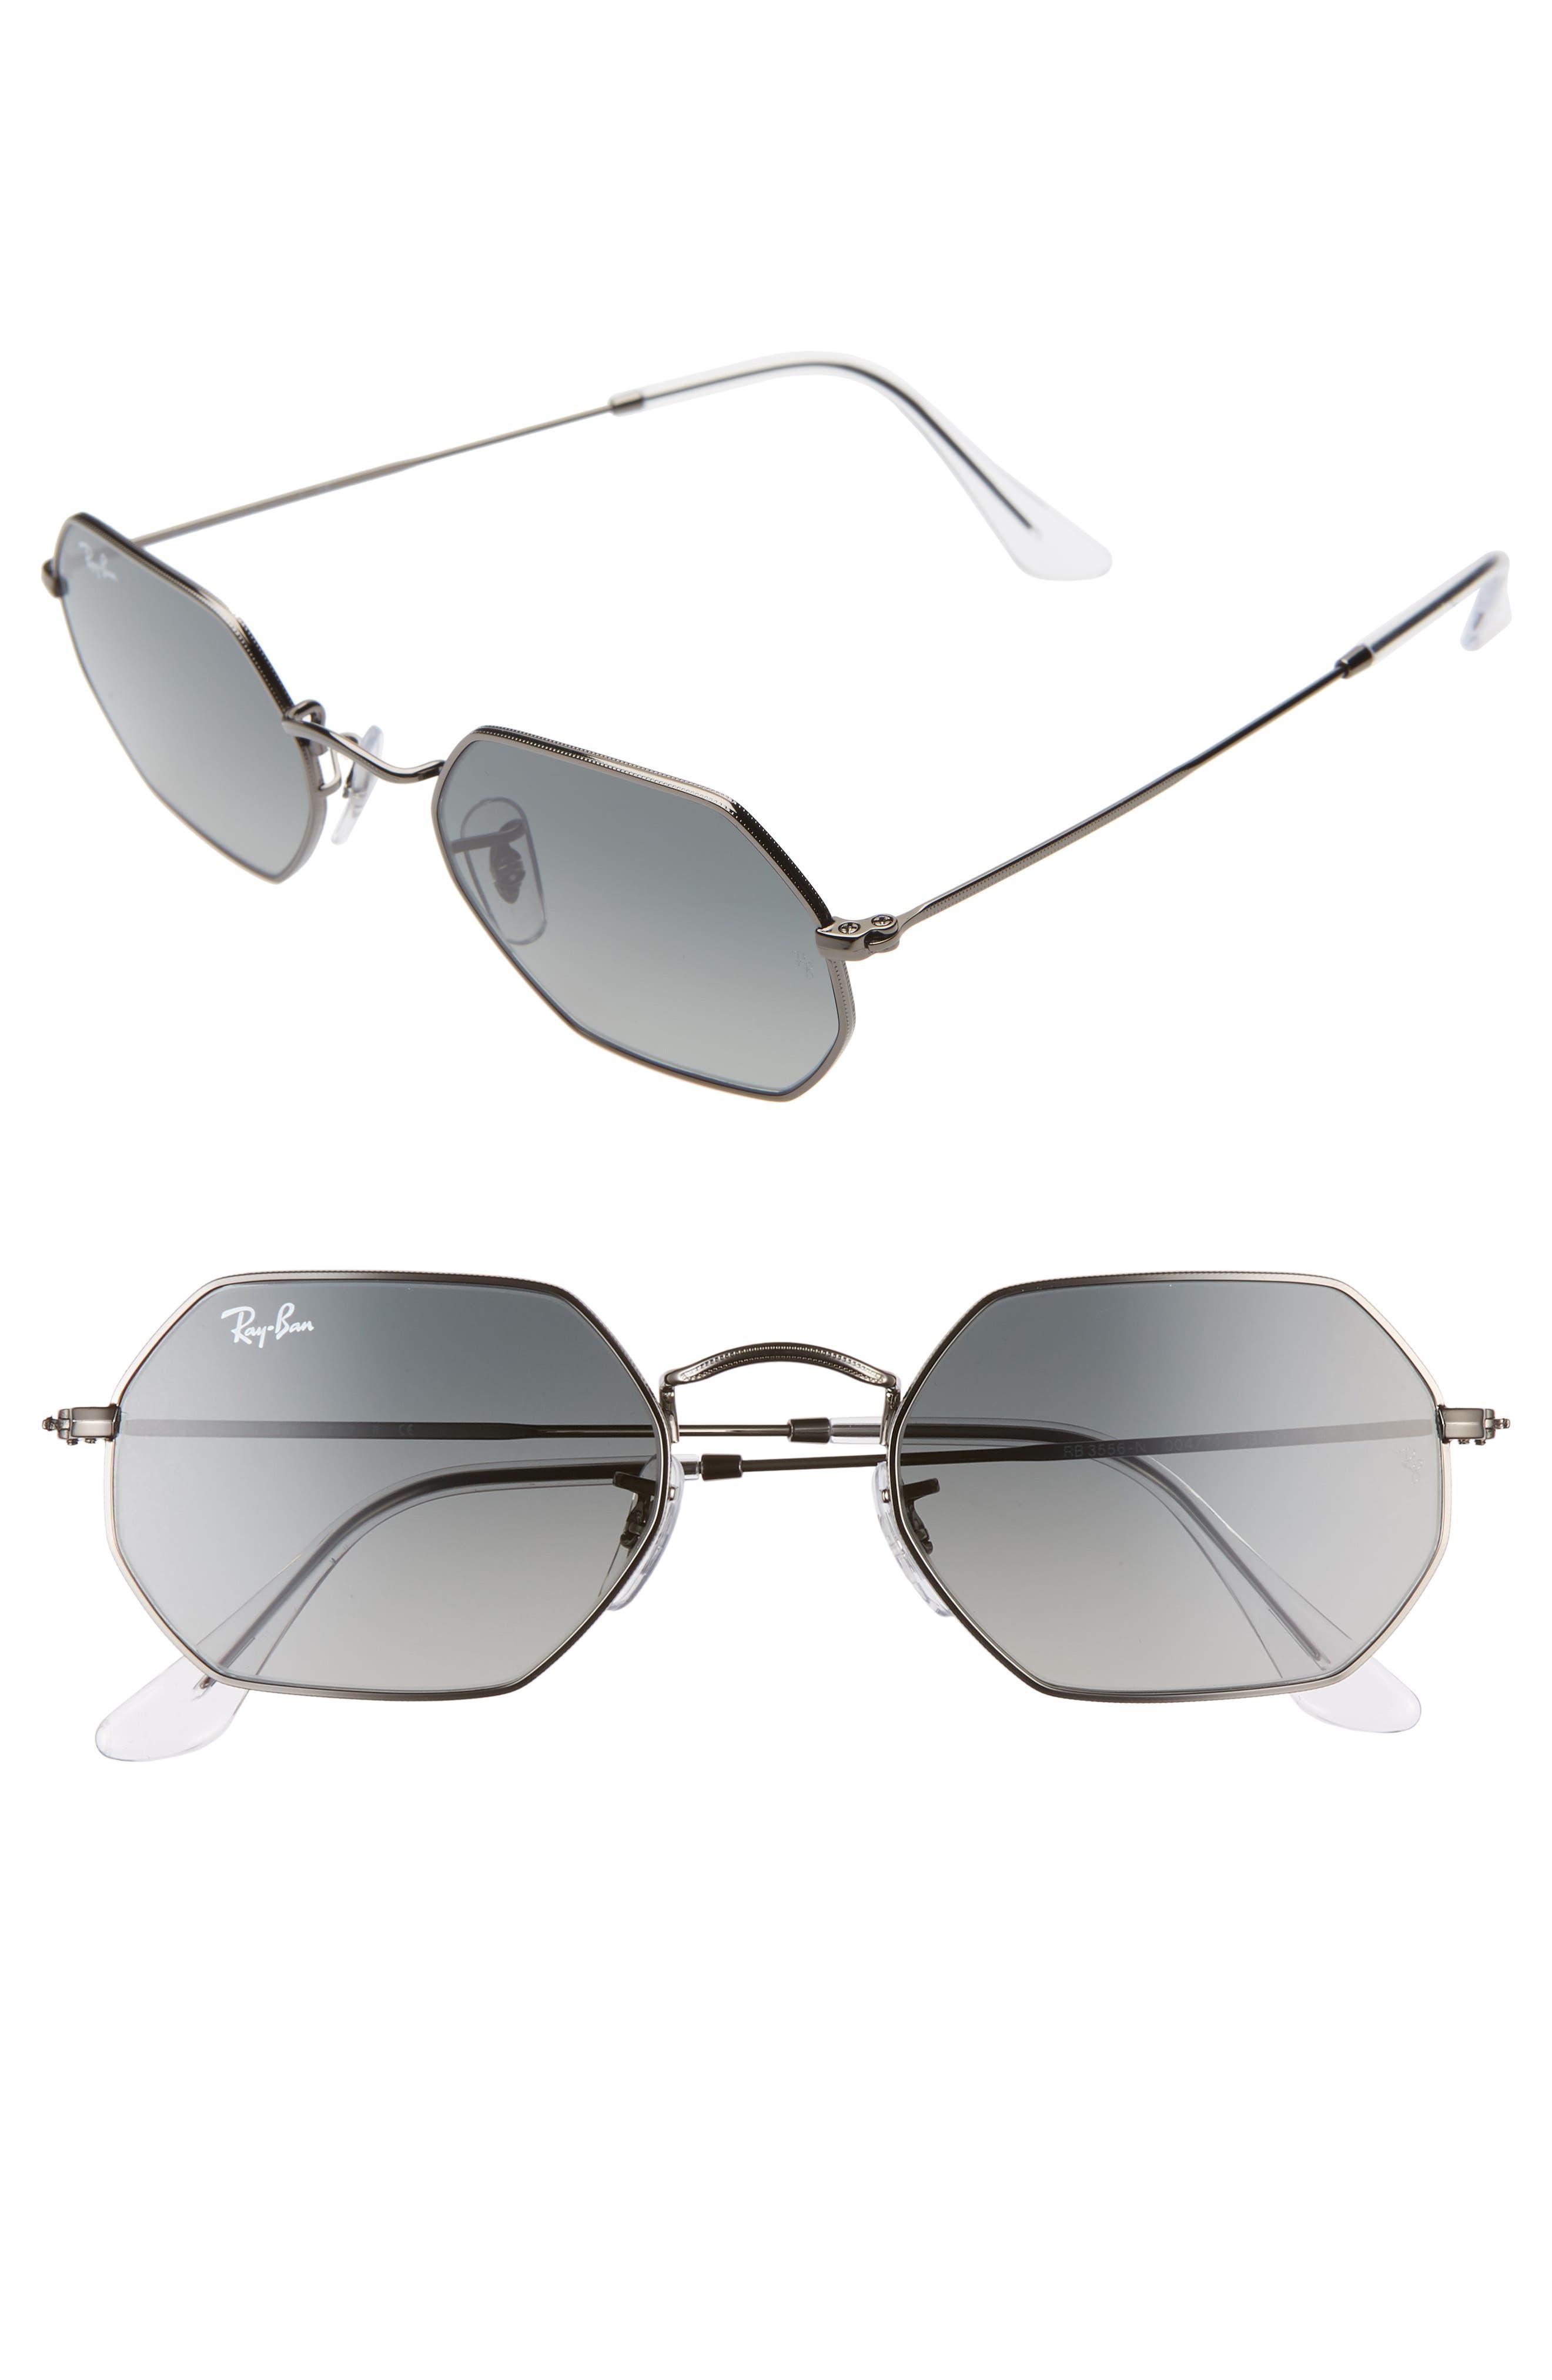 Ray-Ban 5m Rectangular Sunglasses - Gunmetal/ Grey Gradient